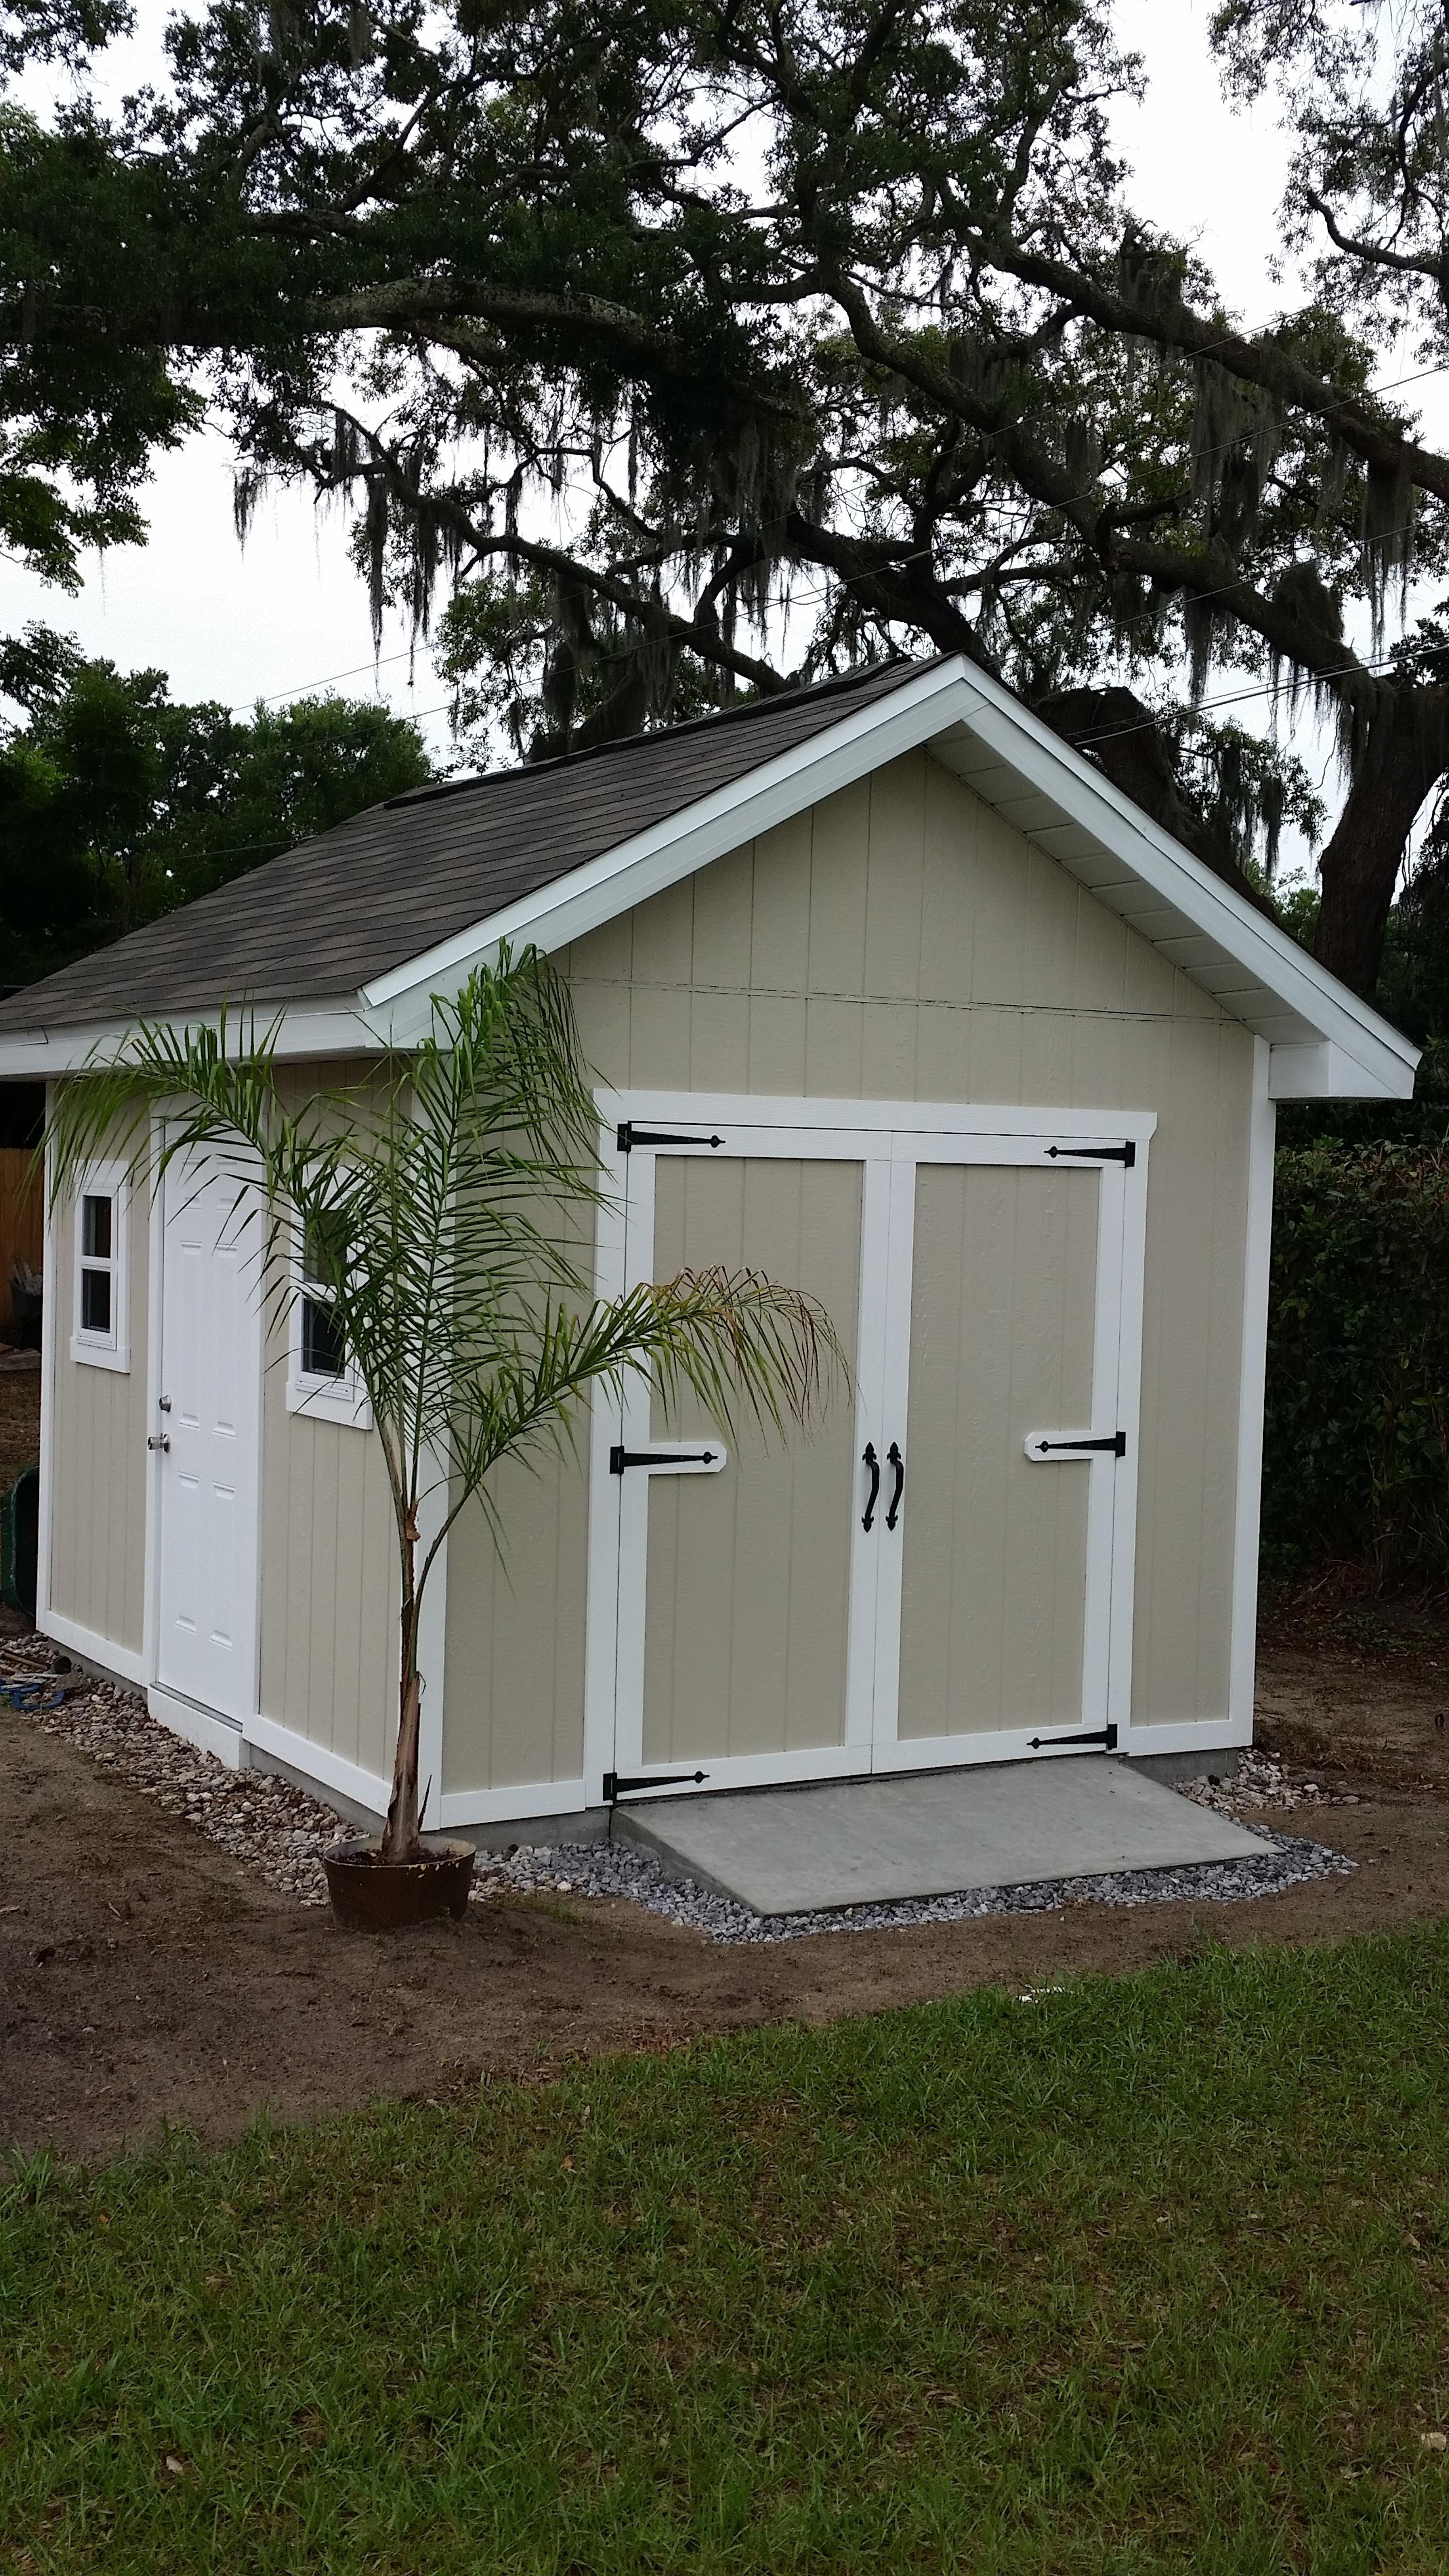 10 X 12 Shed Floor Foundation Yard Sheds Backyard Sheds Garden Shed Floor Ideas